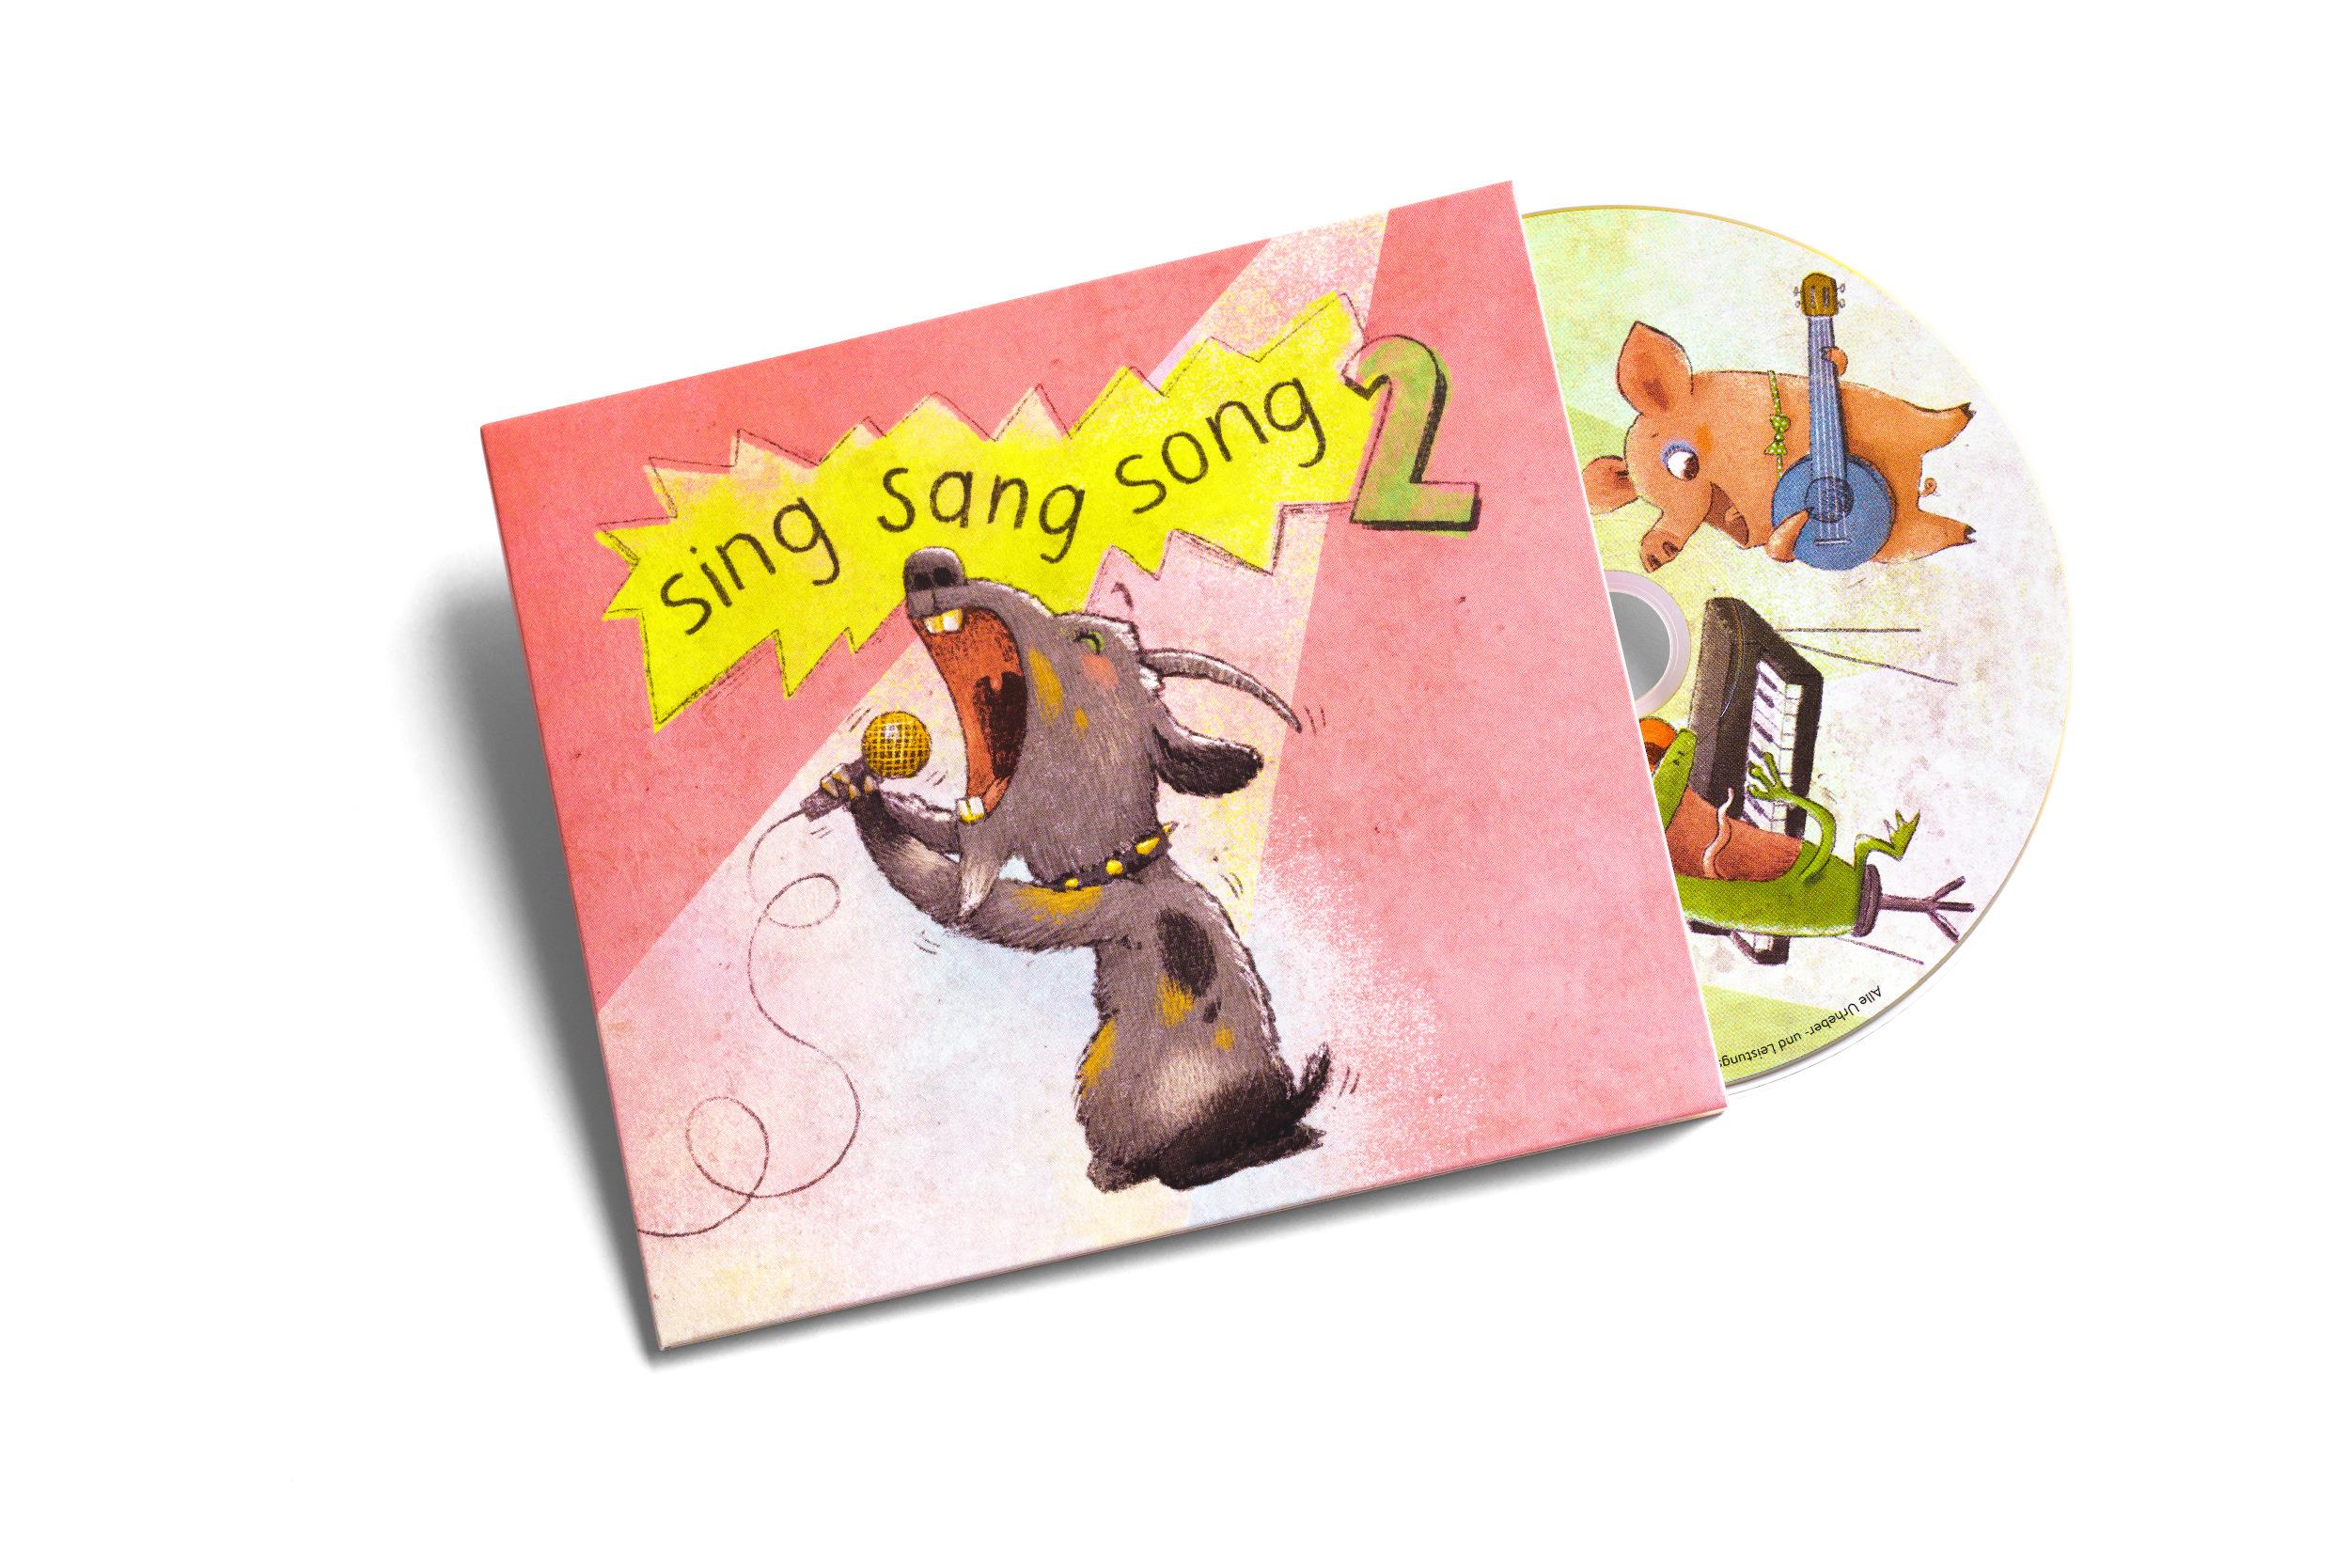 Sing Sang Song 2 CD © Arno Friebes